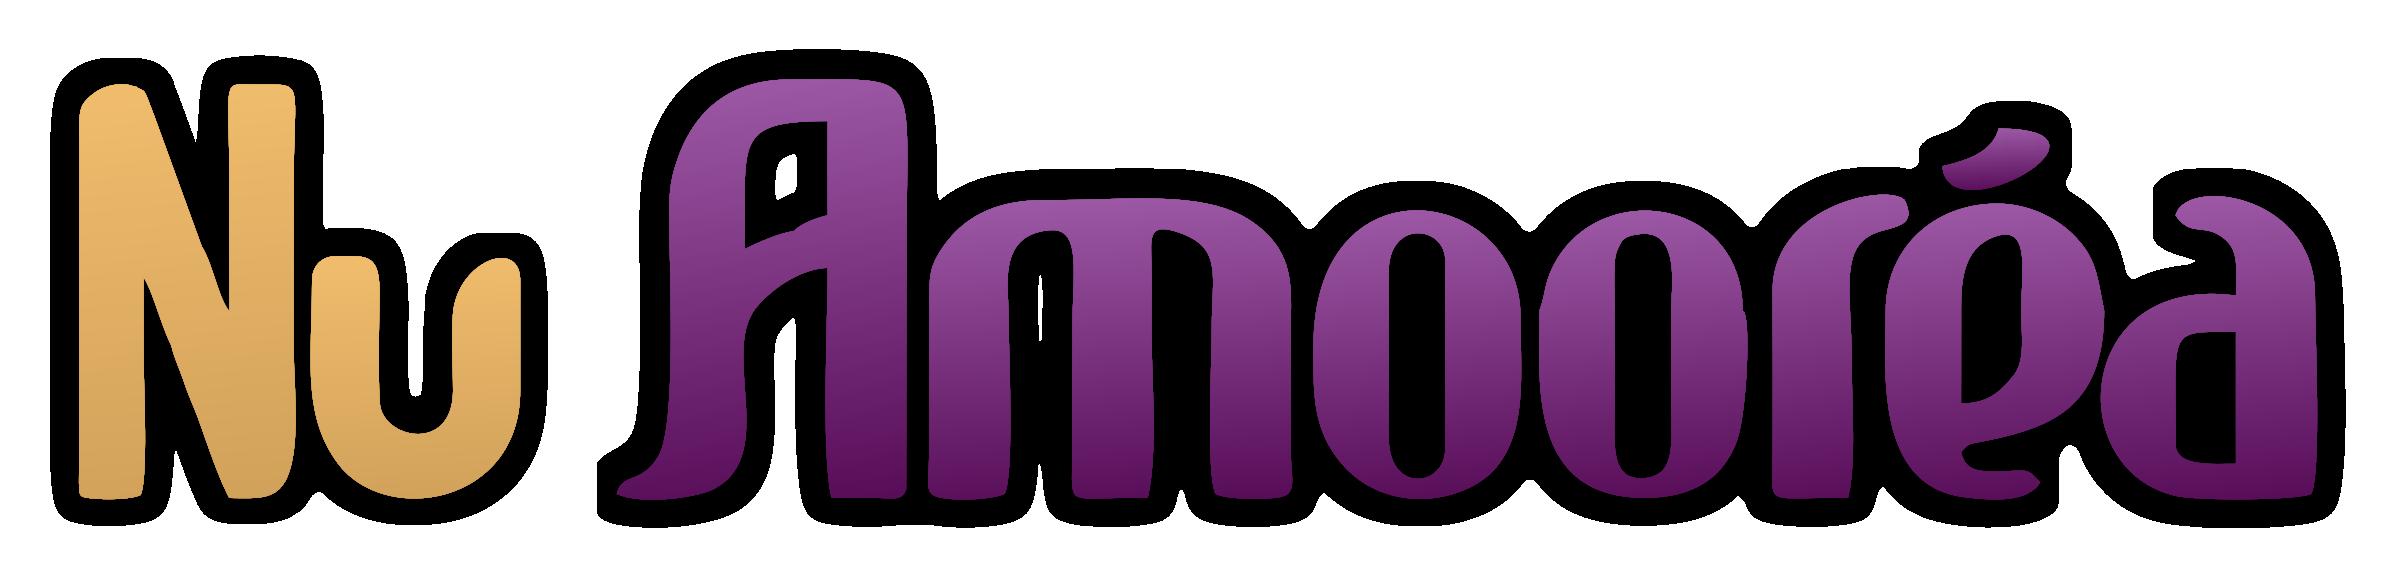 Amoorea adalah sejenis paket perawatan wajah dan tubuh yang berbentuk sabun                                  batangan dengan bahan dasar yaitu Heilmoor Clay yang merupakan                                  endapan lumpur Austria yang diambil dari kota Heilmoor,                                  perbatasan antara Austria dan Czech republic  (Chekoslovakia) di Eropa.